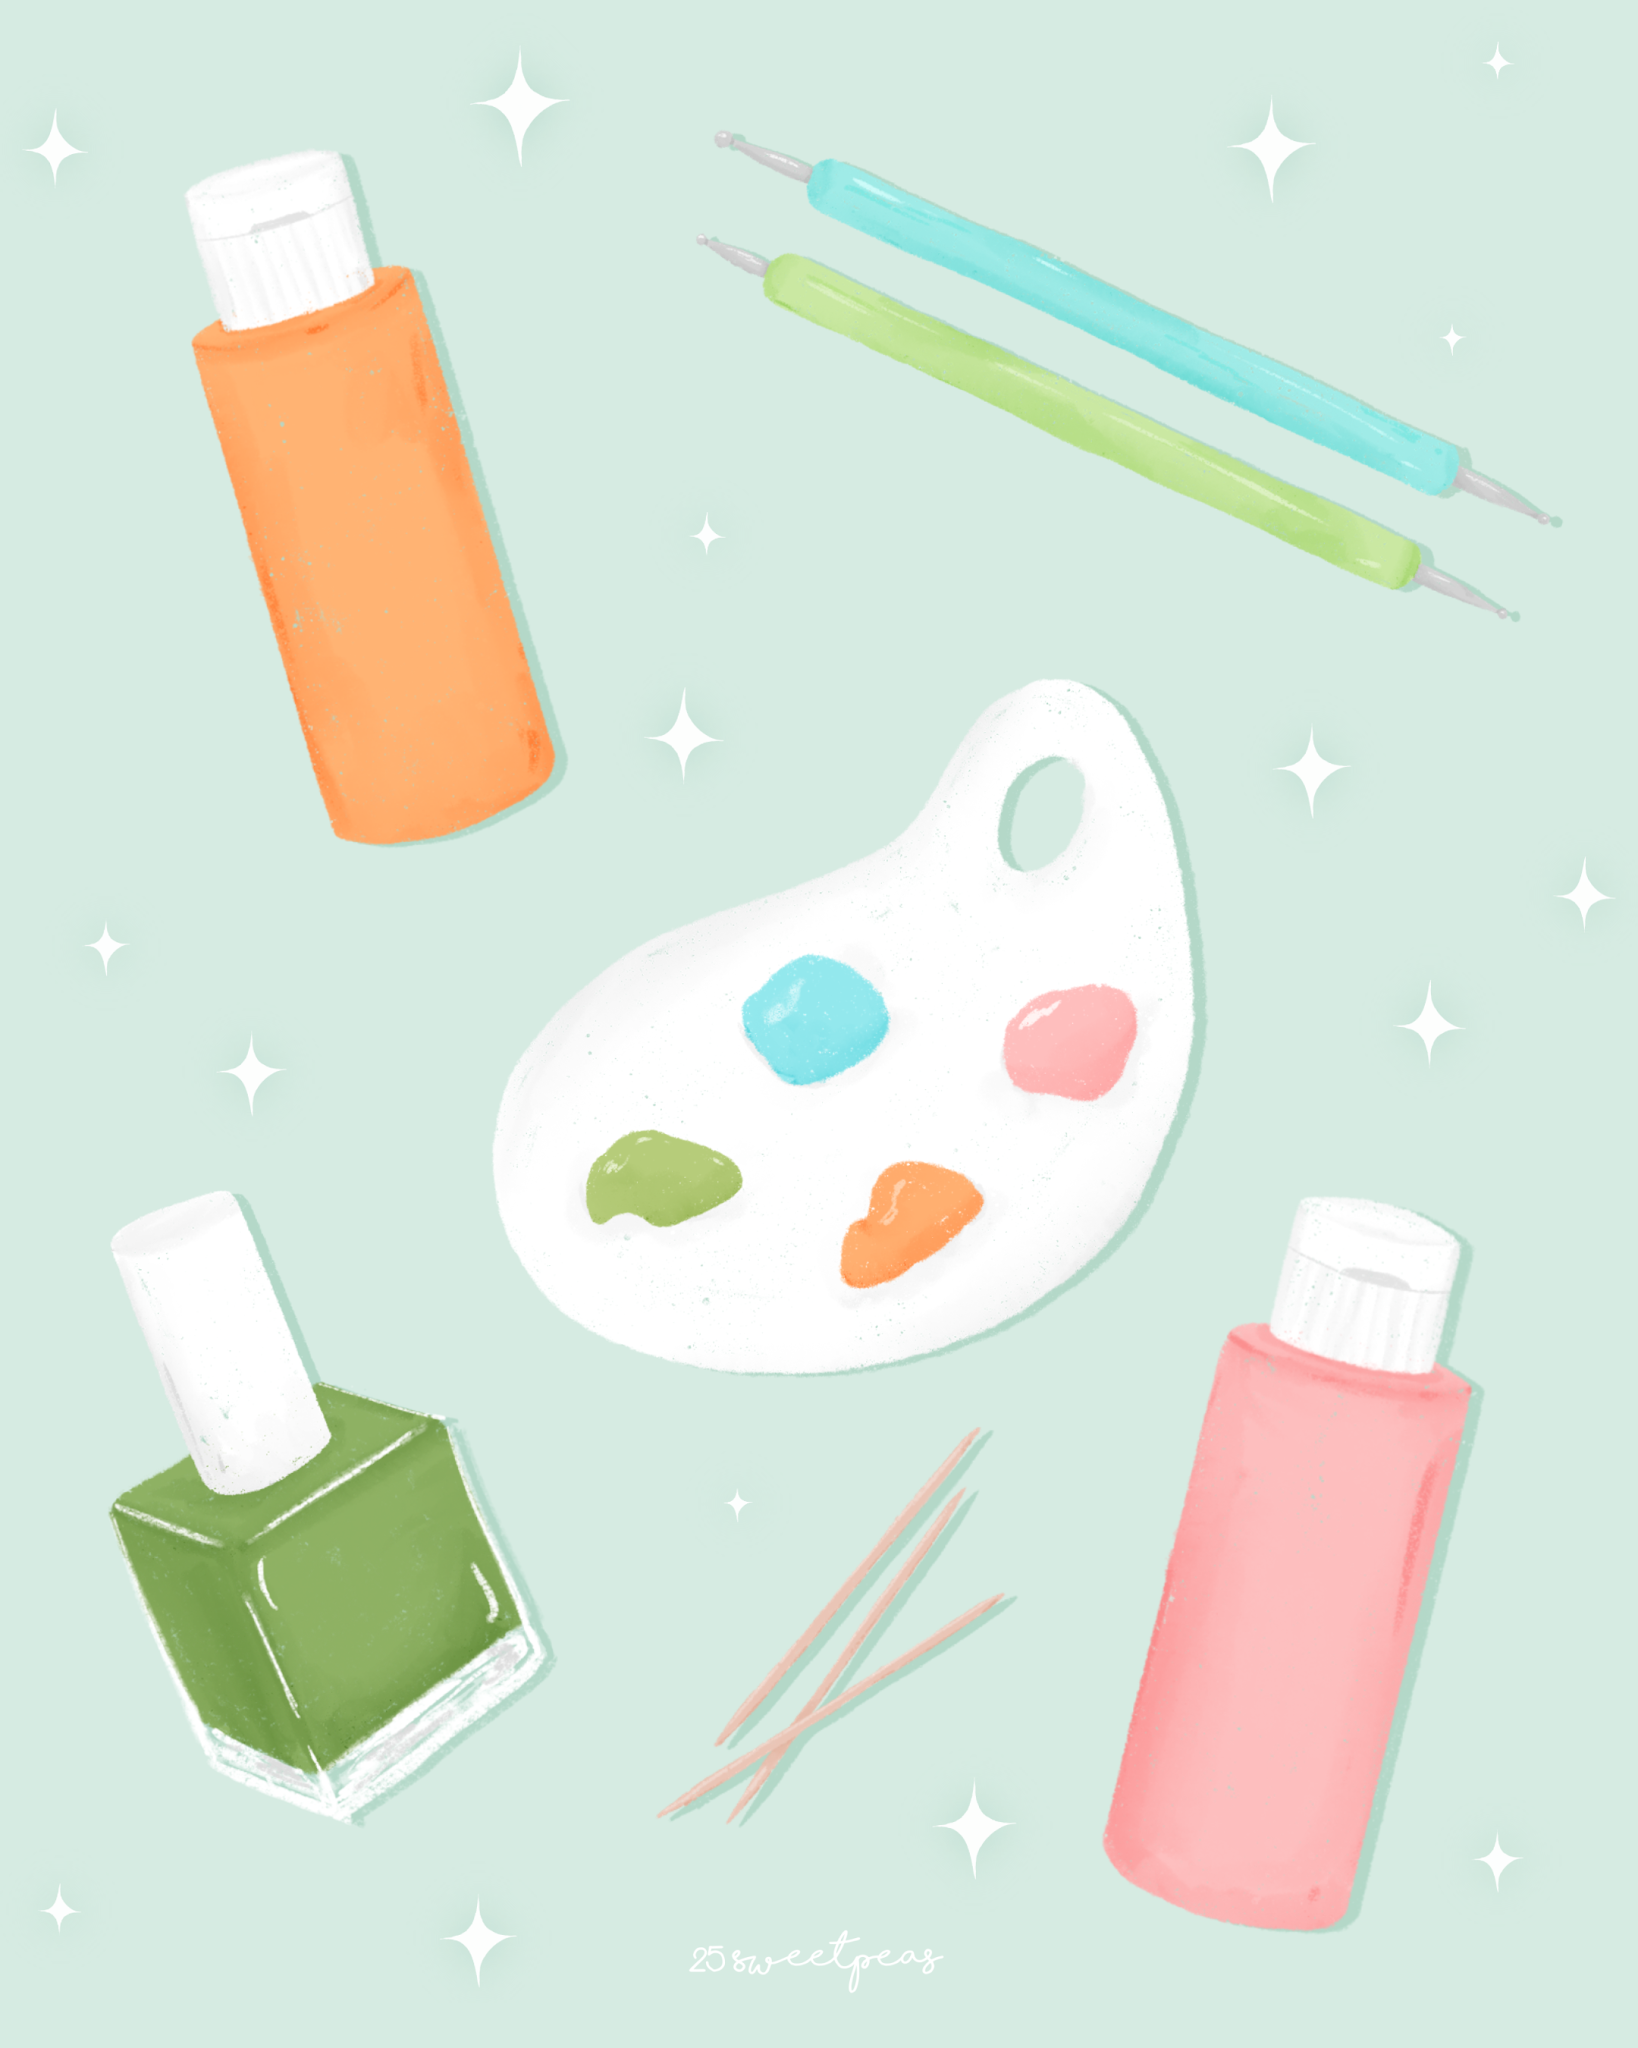 Acrylic Paint VS Nail Polish for Nail Art Details 25 Sweetpeas